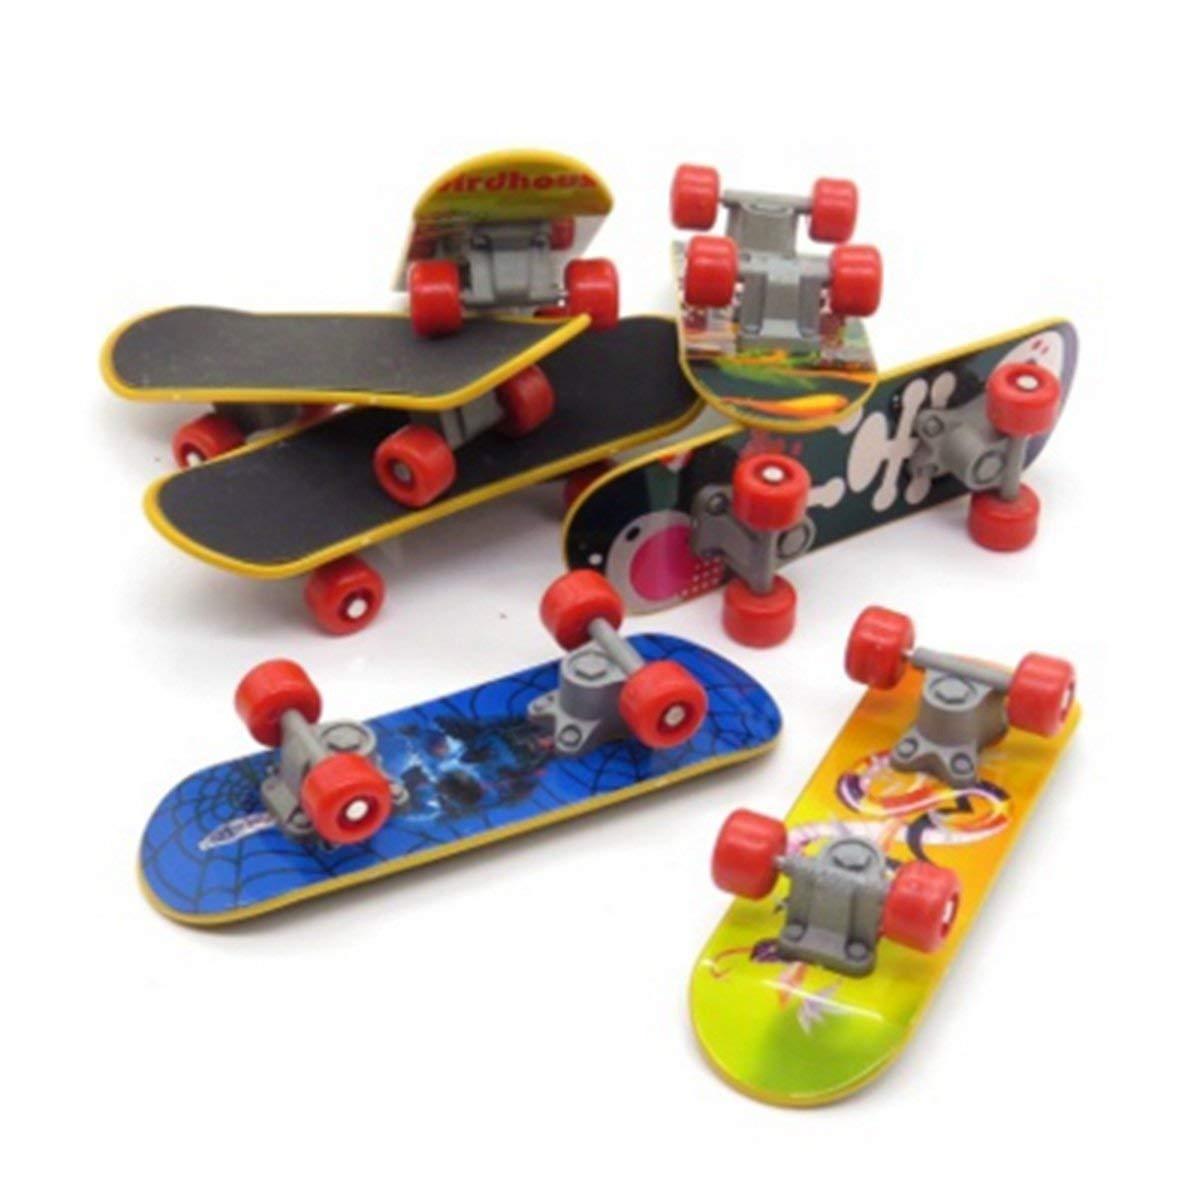 WINBOB 6 pcs Professional Mini Fingerboards/ Finger Skateboard, Unique matte surface (Random Pattern), Kids Toy Gift Party Favors